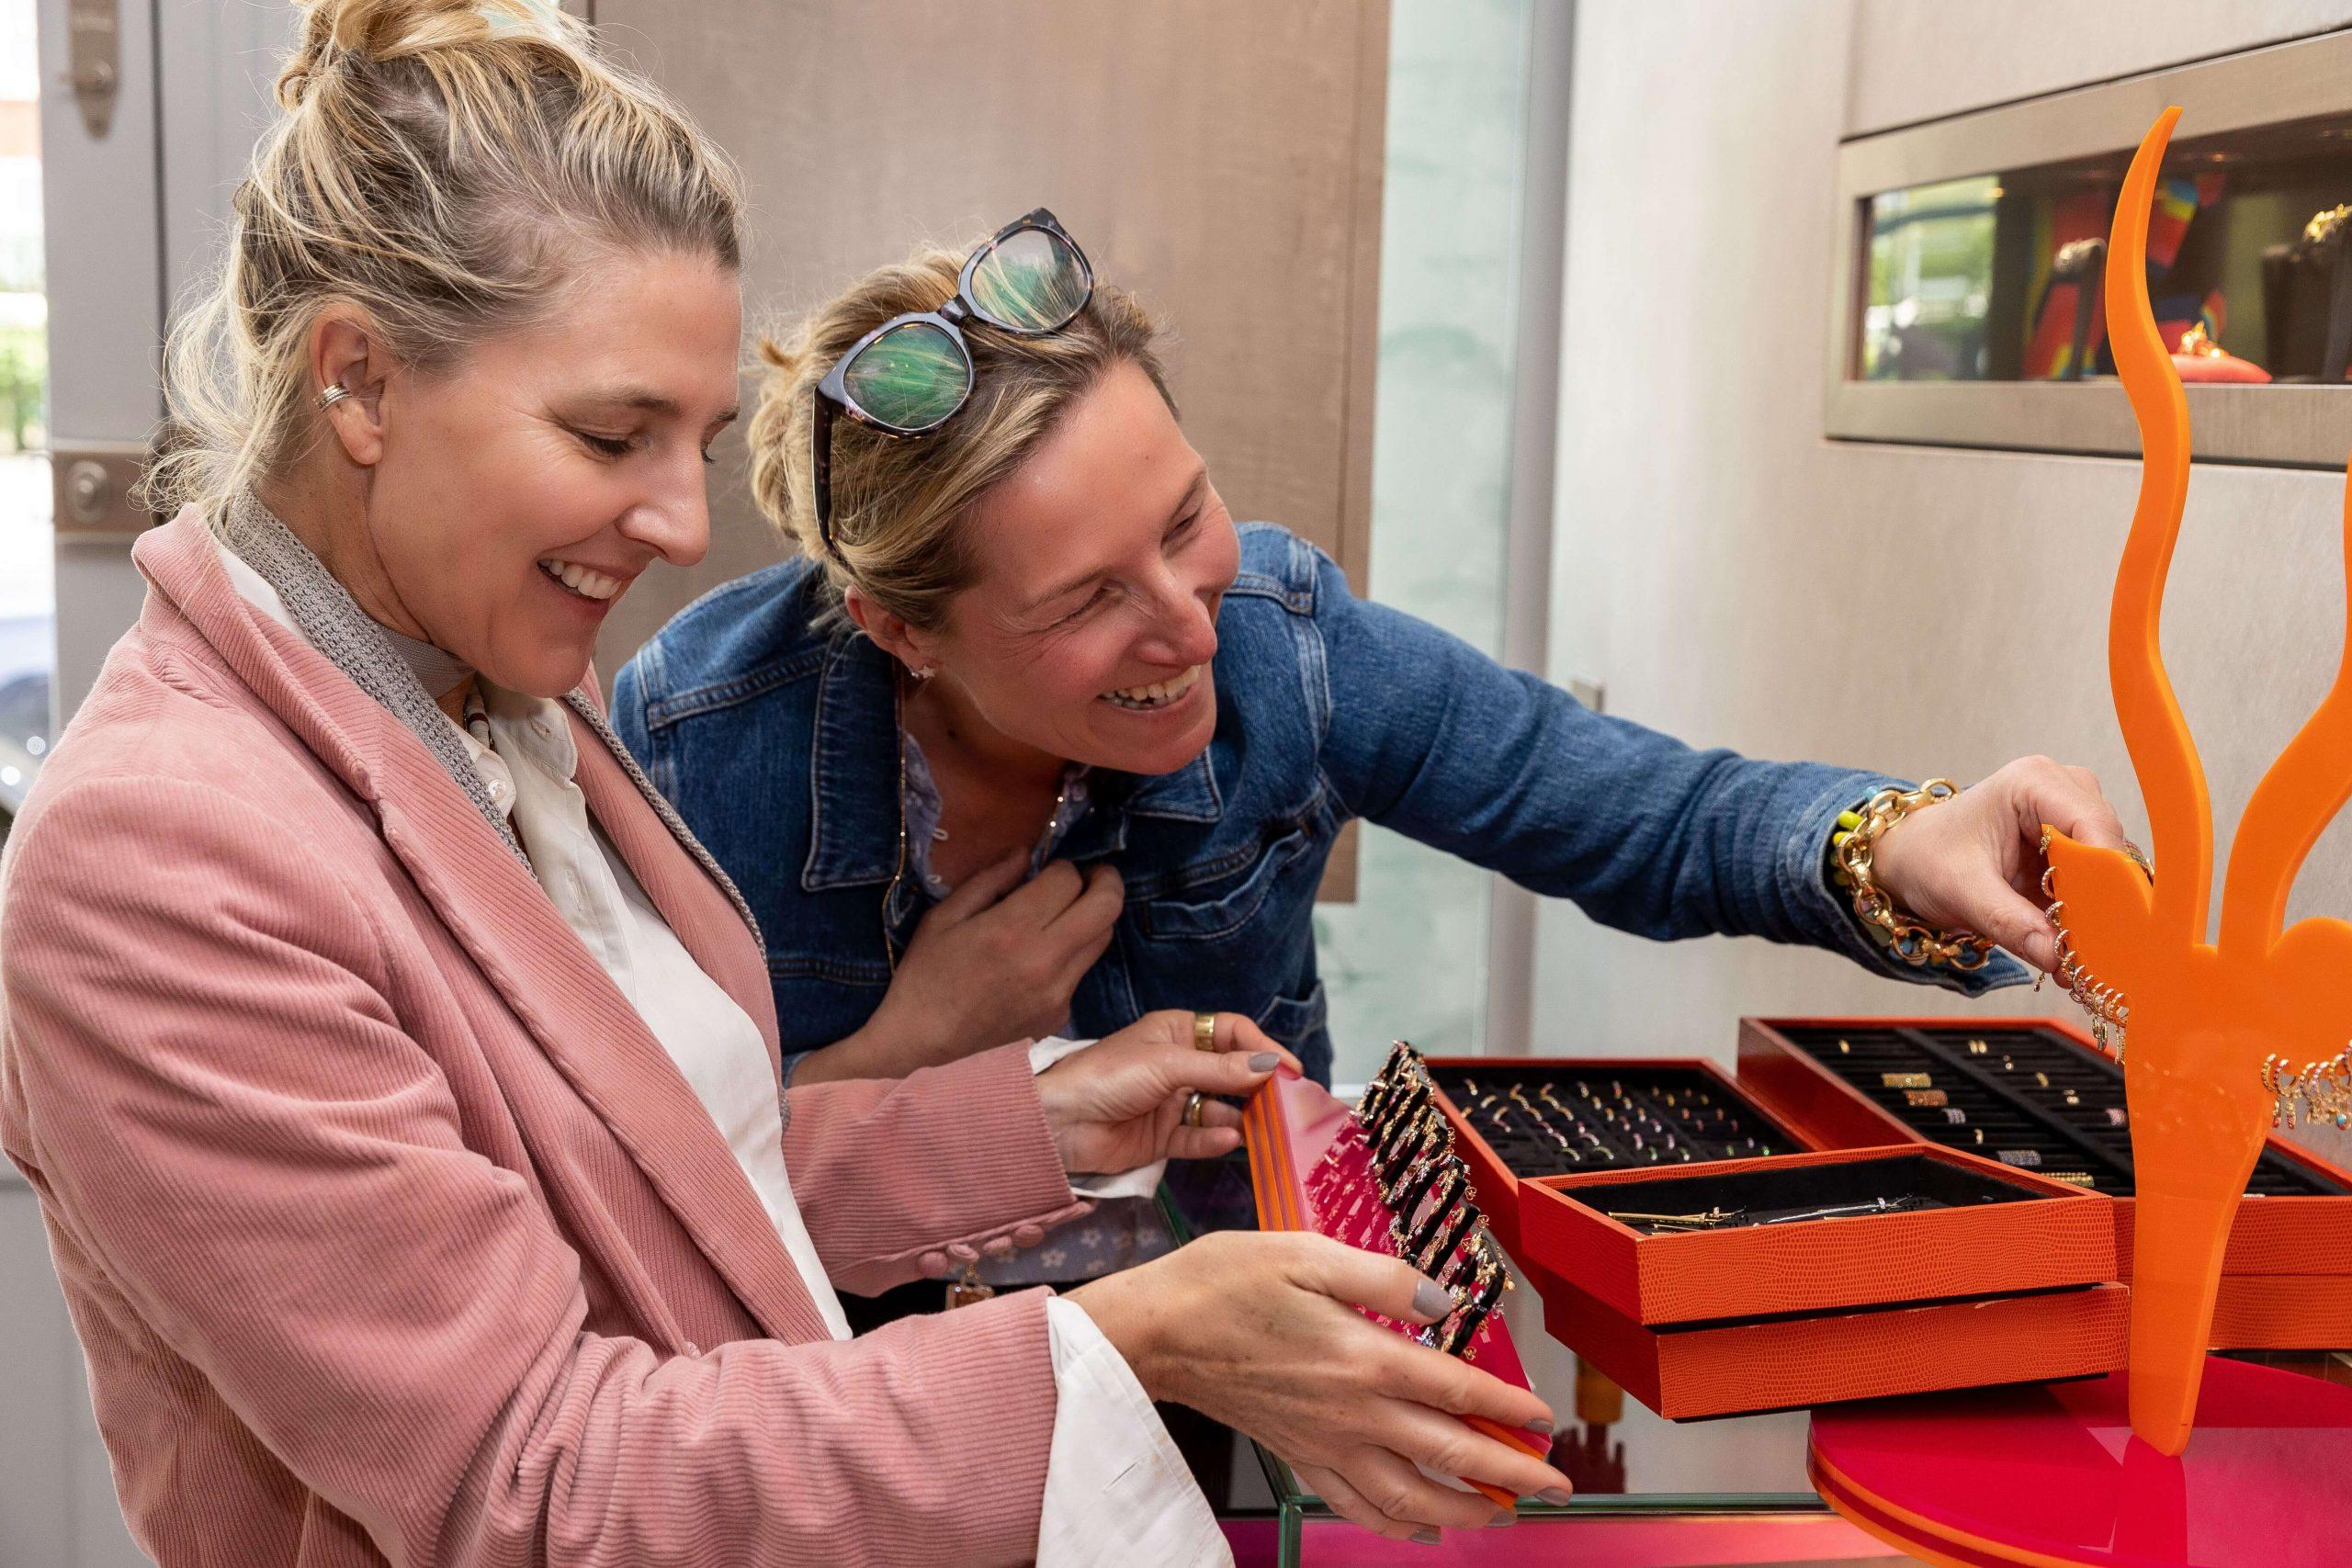 Condé Nast Traveller Editor Melinda Stevens choosing fine jewellery with Vanessa Chilton